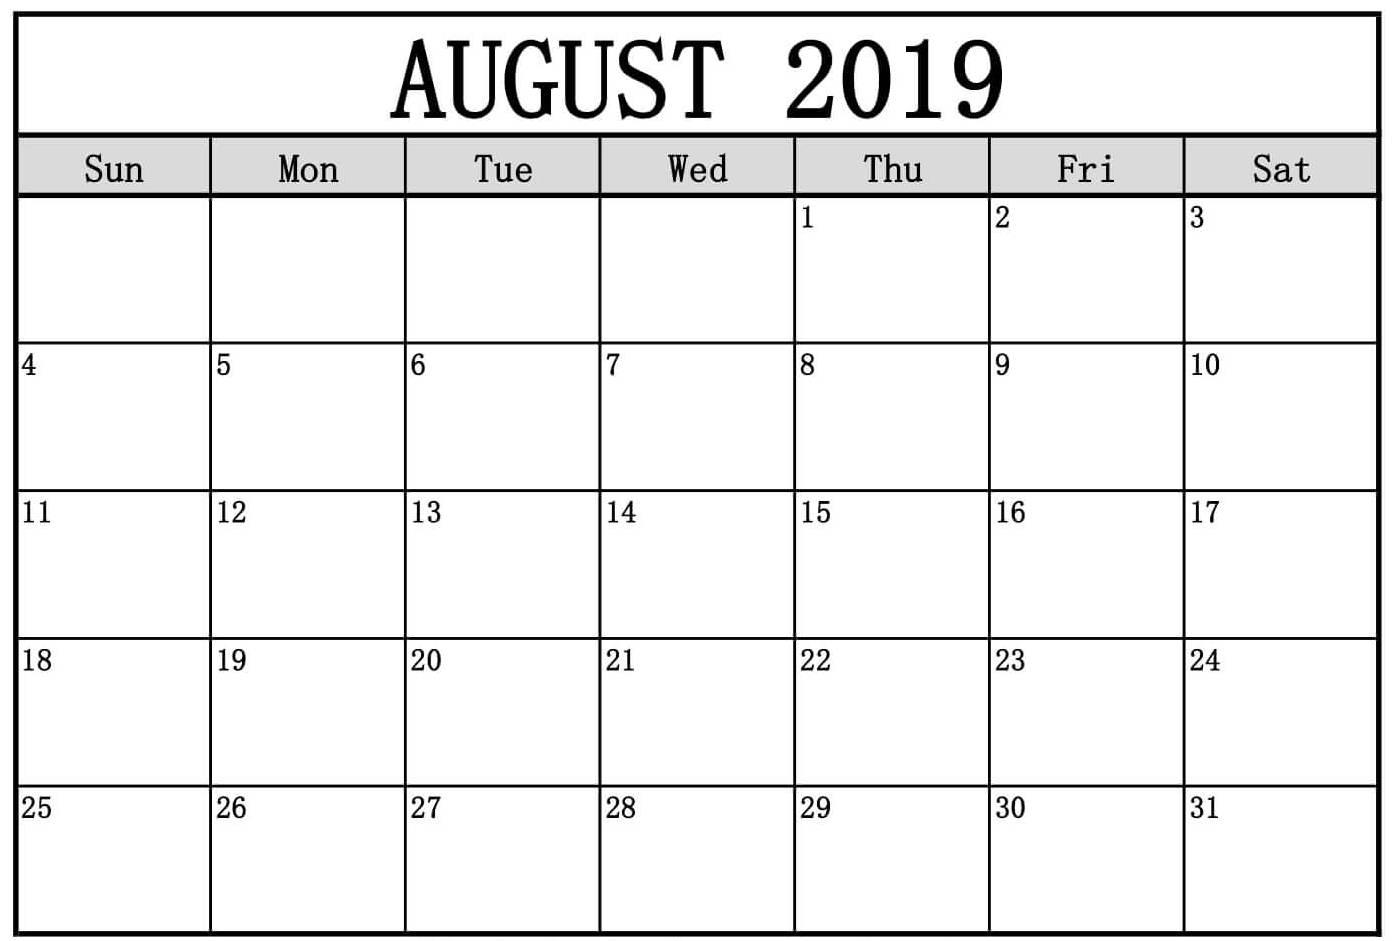 Fillable August 2019 Calendar Blank Template